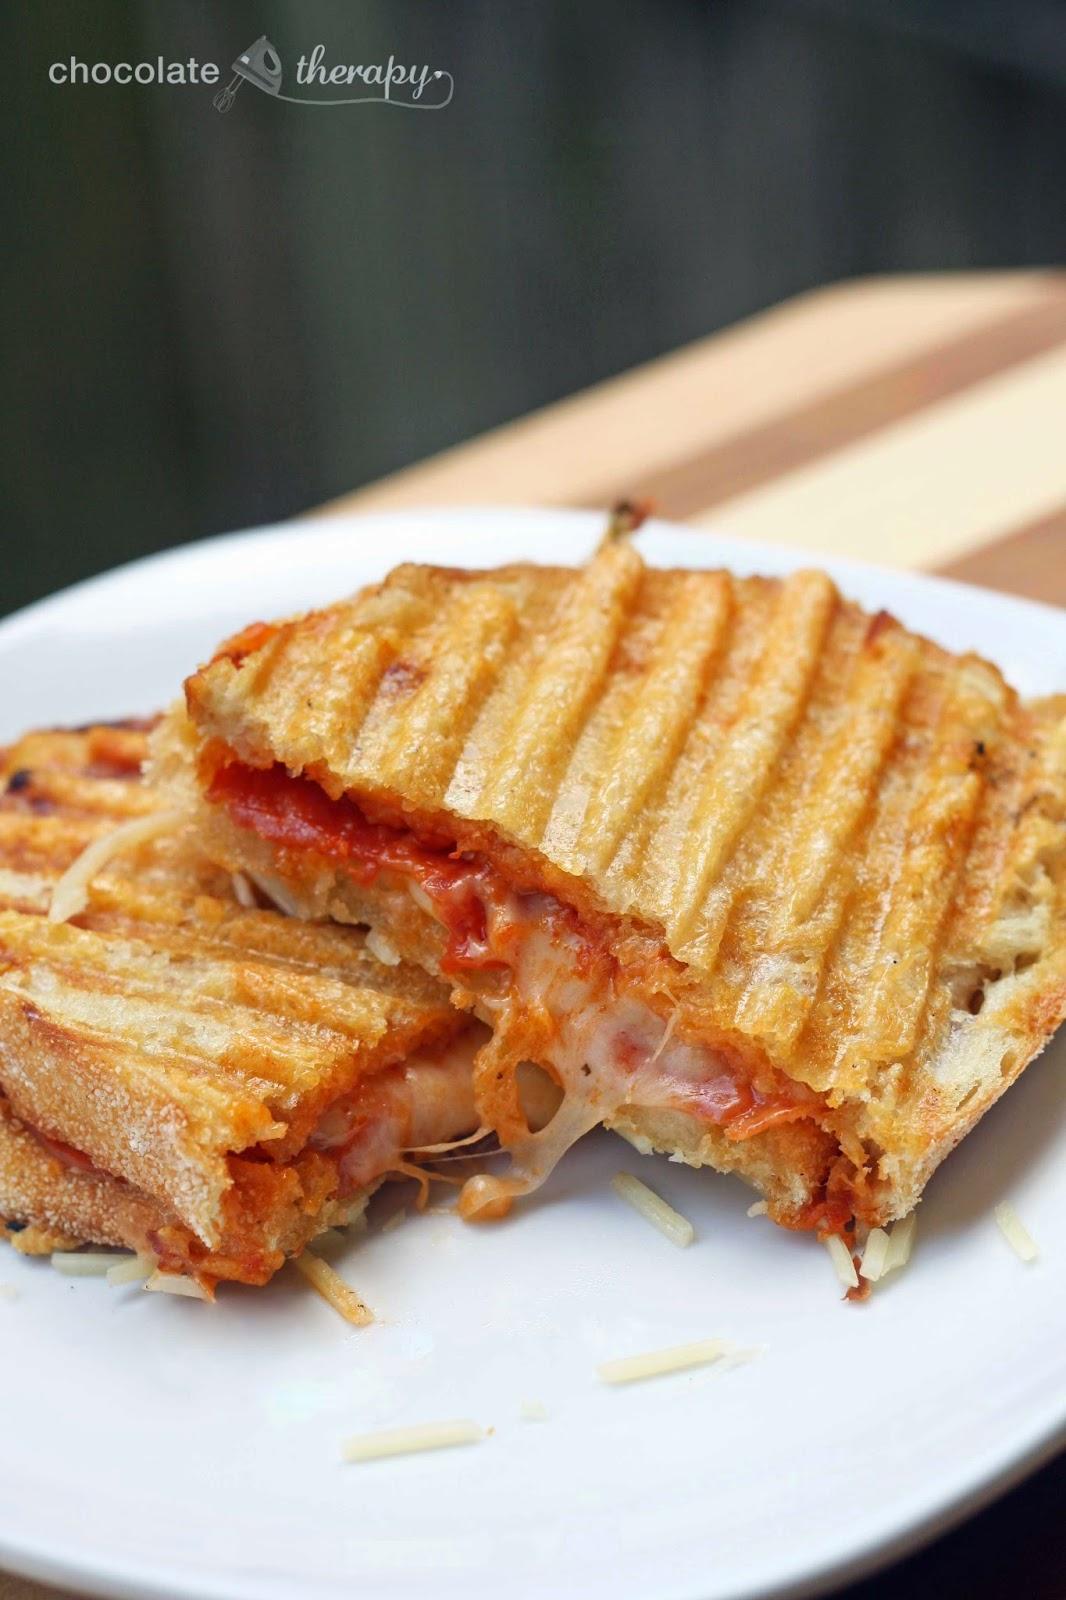 panini panini avocado grilled panini grilled pizza panini panini happy ...